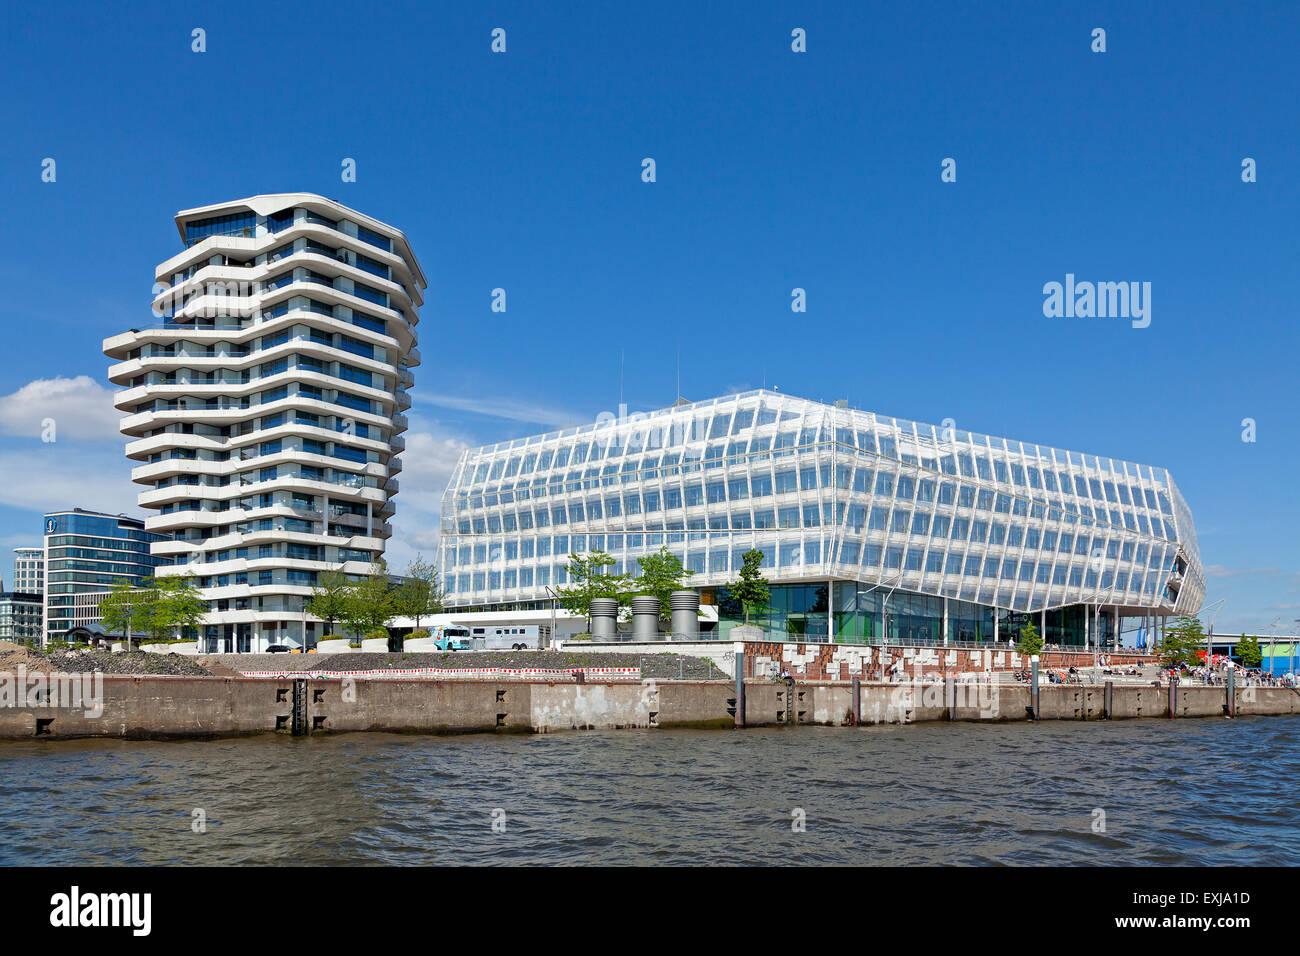 Hamburg Marco Polo Tower marco polo tower unilever house harbour city hamburg germany